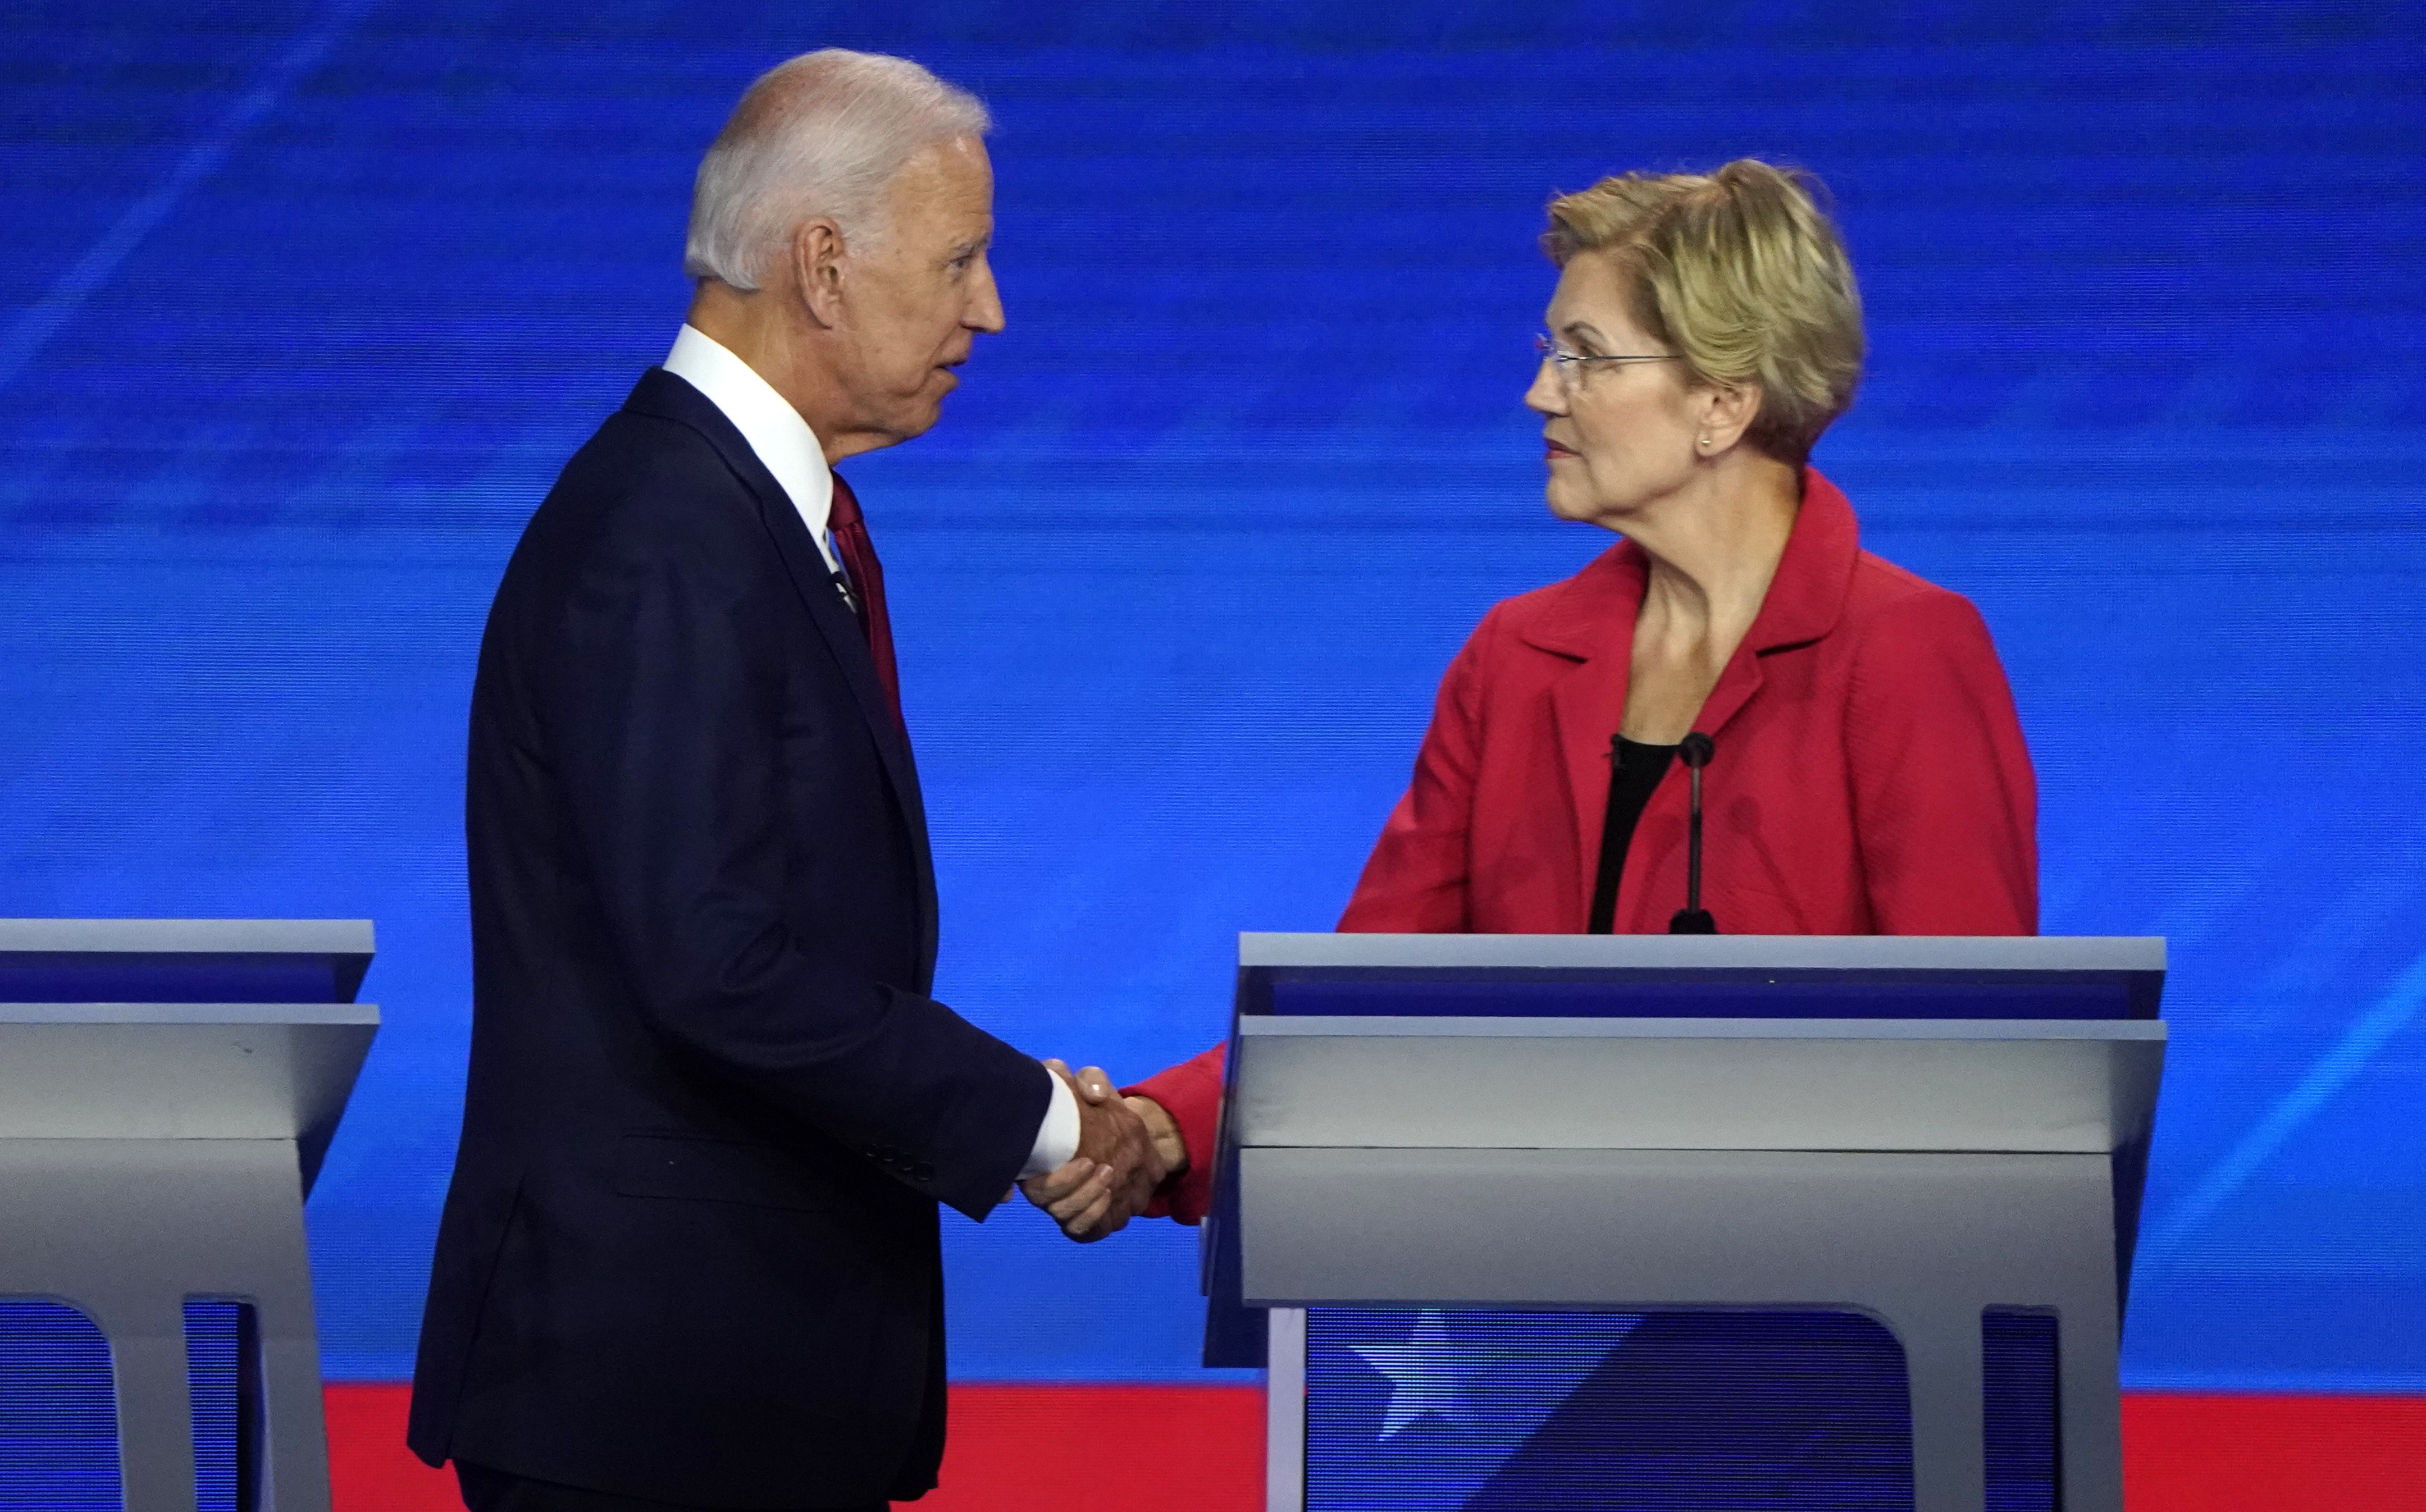 Former Vice President Joe Biden shake hands with Senator Elizabeth Warren at the conclusion of the 2020 Democratic U.S. presidential debate in Houston, Texas, U.S., September 12, 2019. REUTERS/Mike Blake - HP1EF9D087563